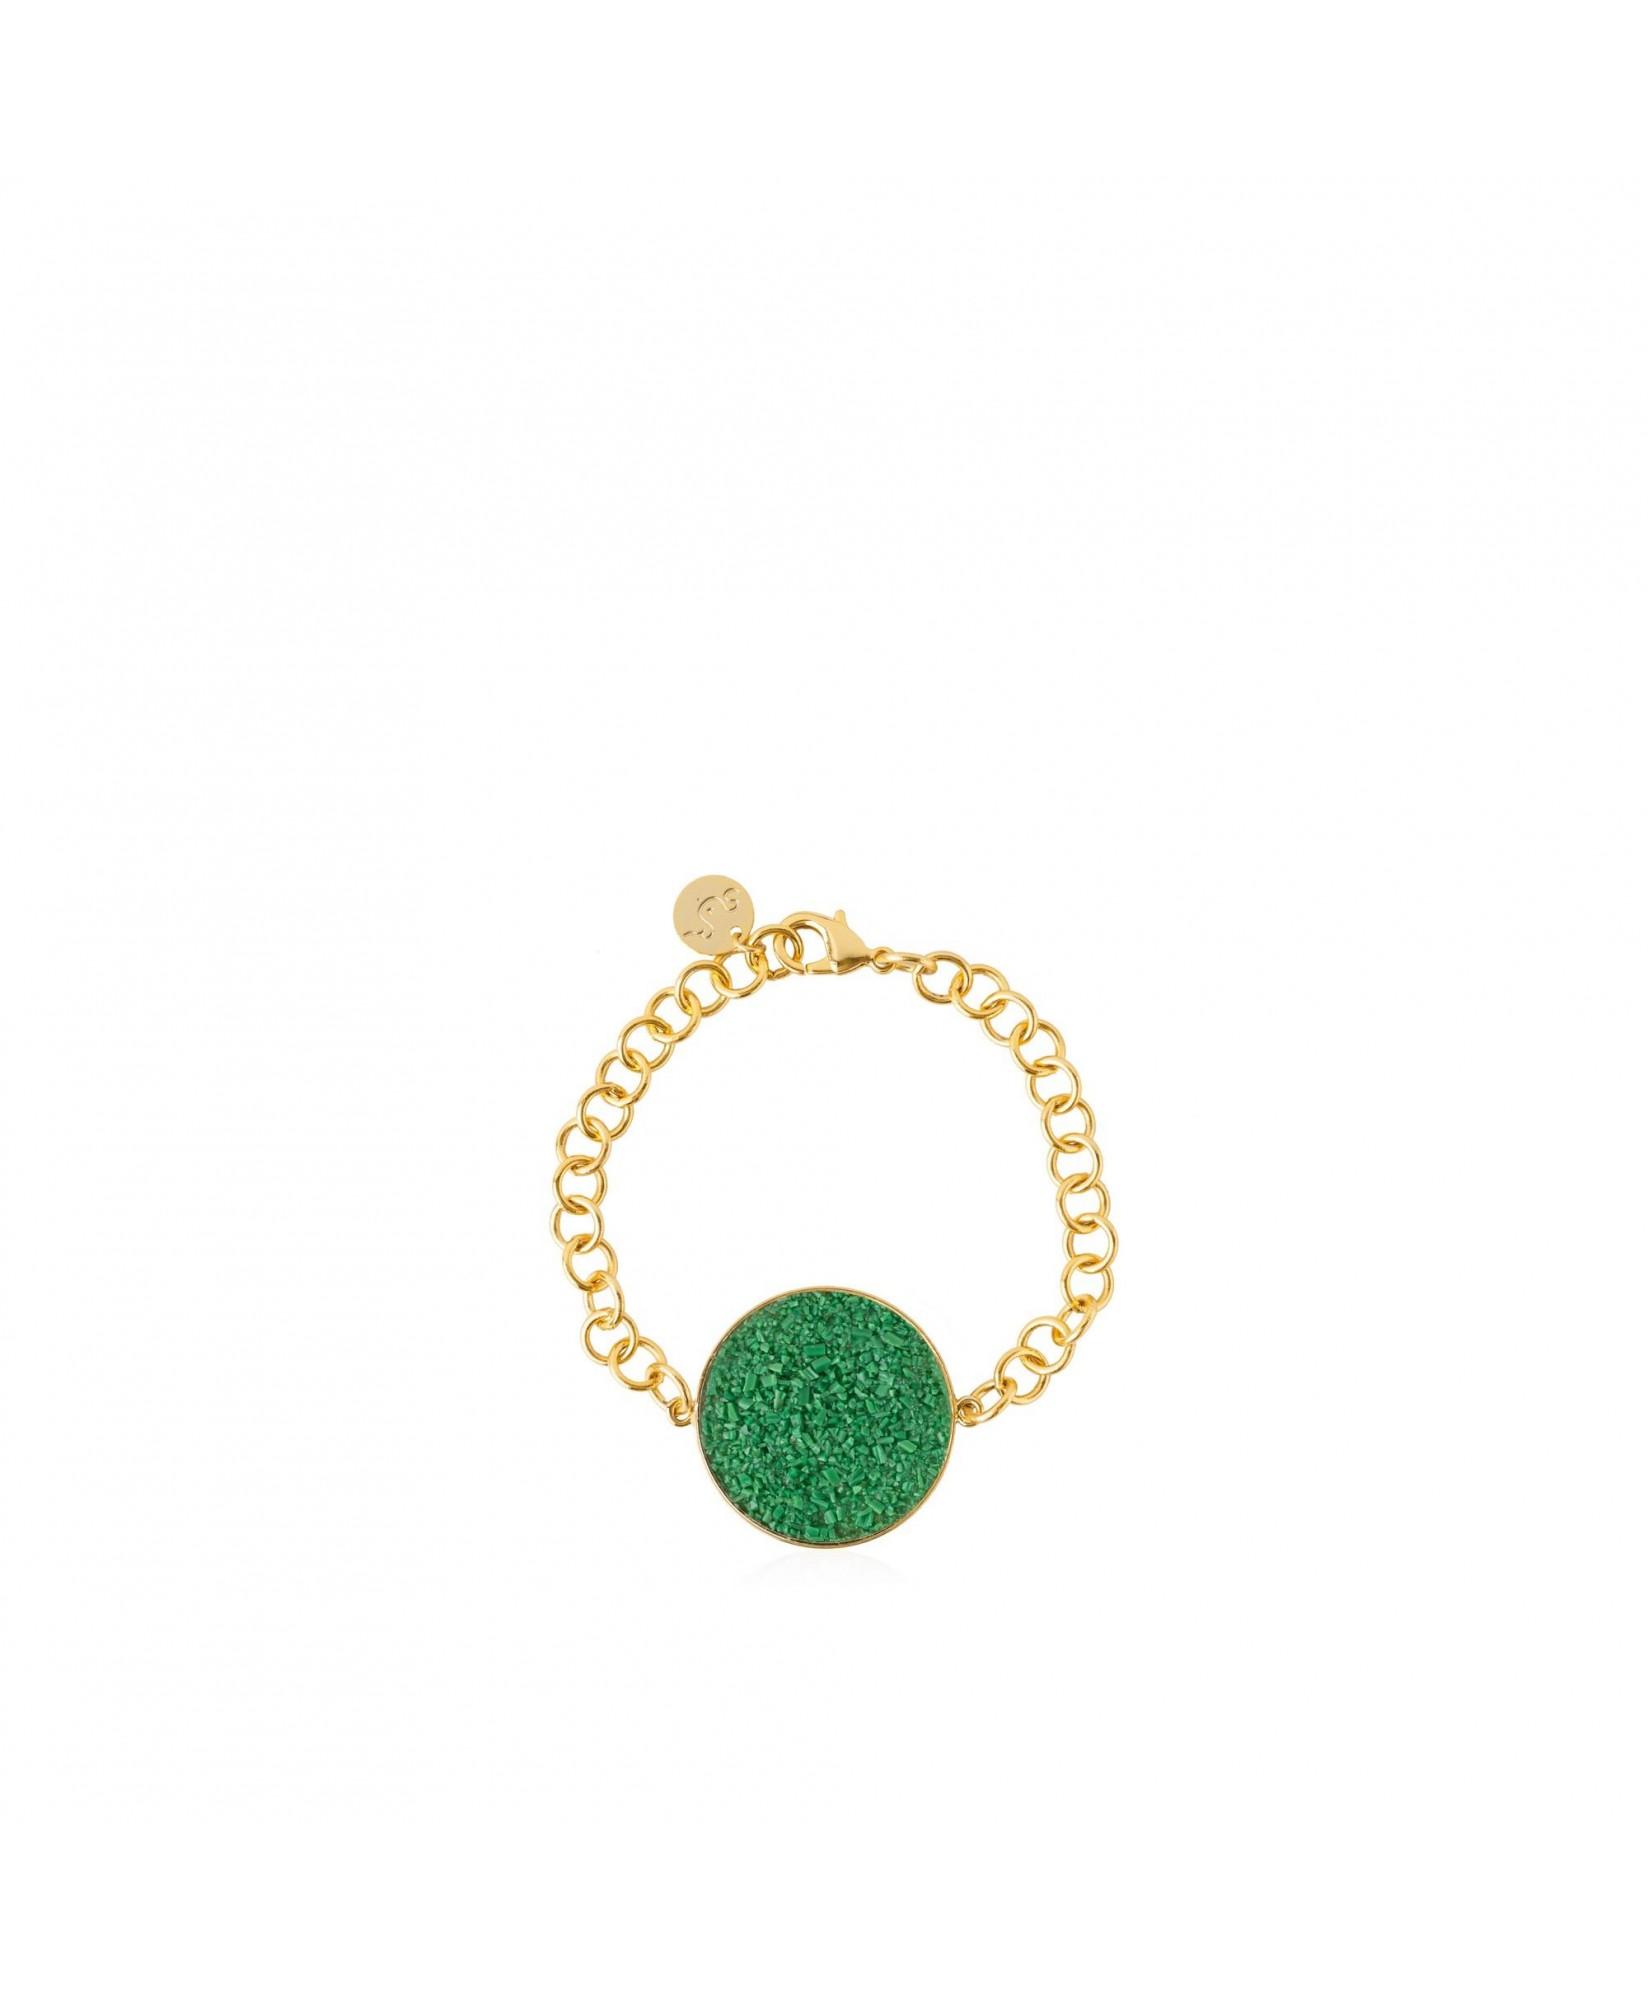 Pulsera oro Demeter con nácar verde Pulsera oro Demeter con nácar verde